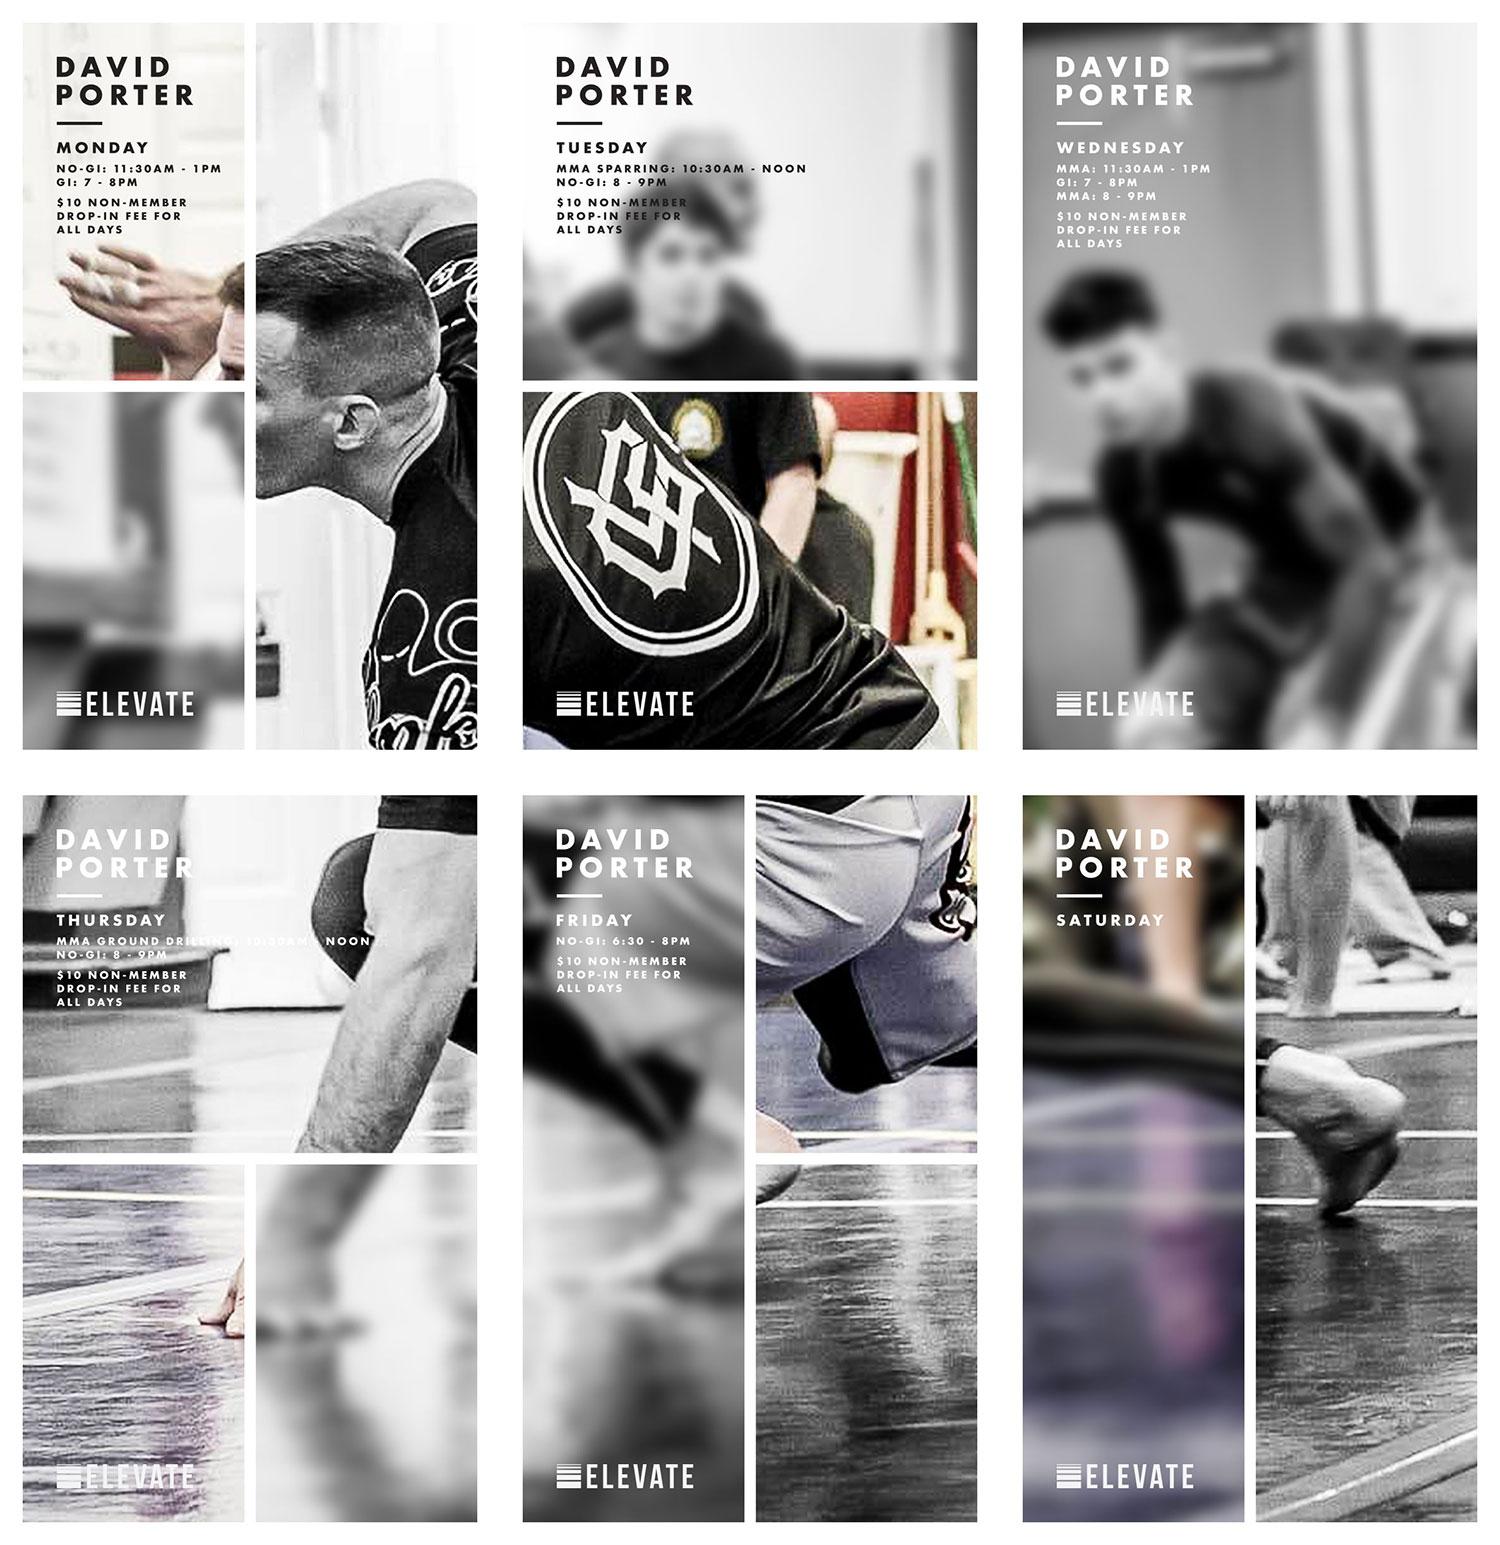 Elevate MMA Academy David Porter Poster